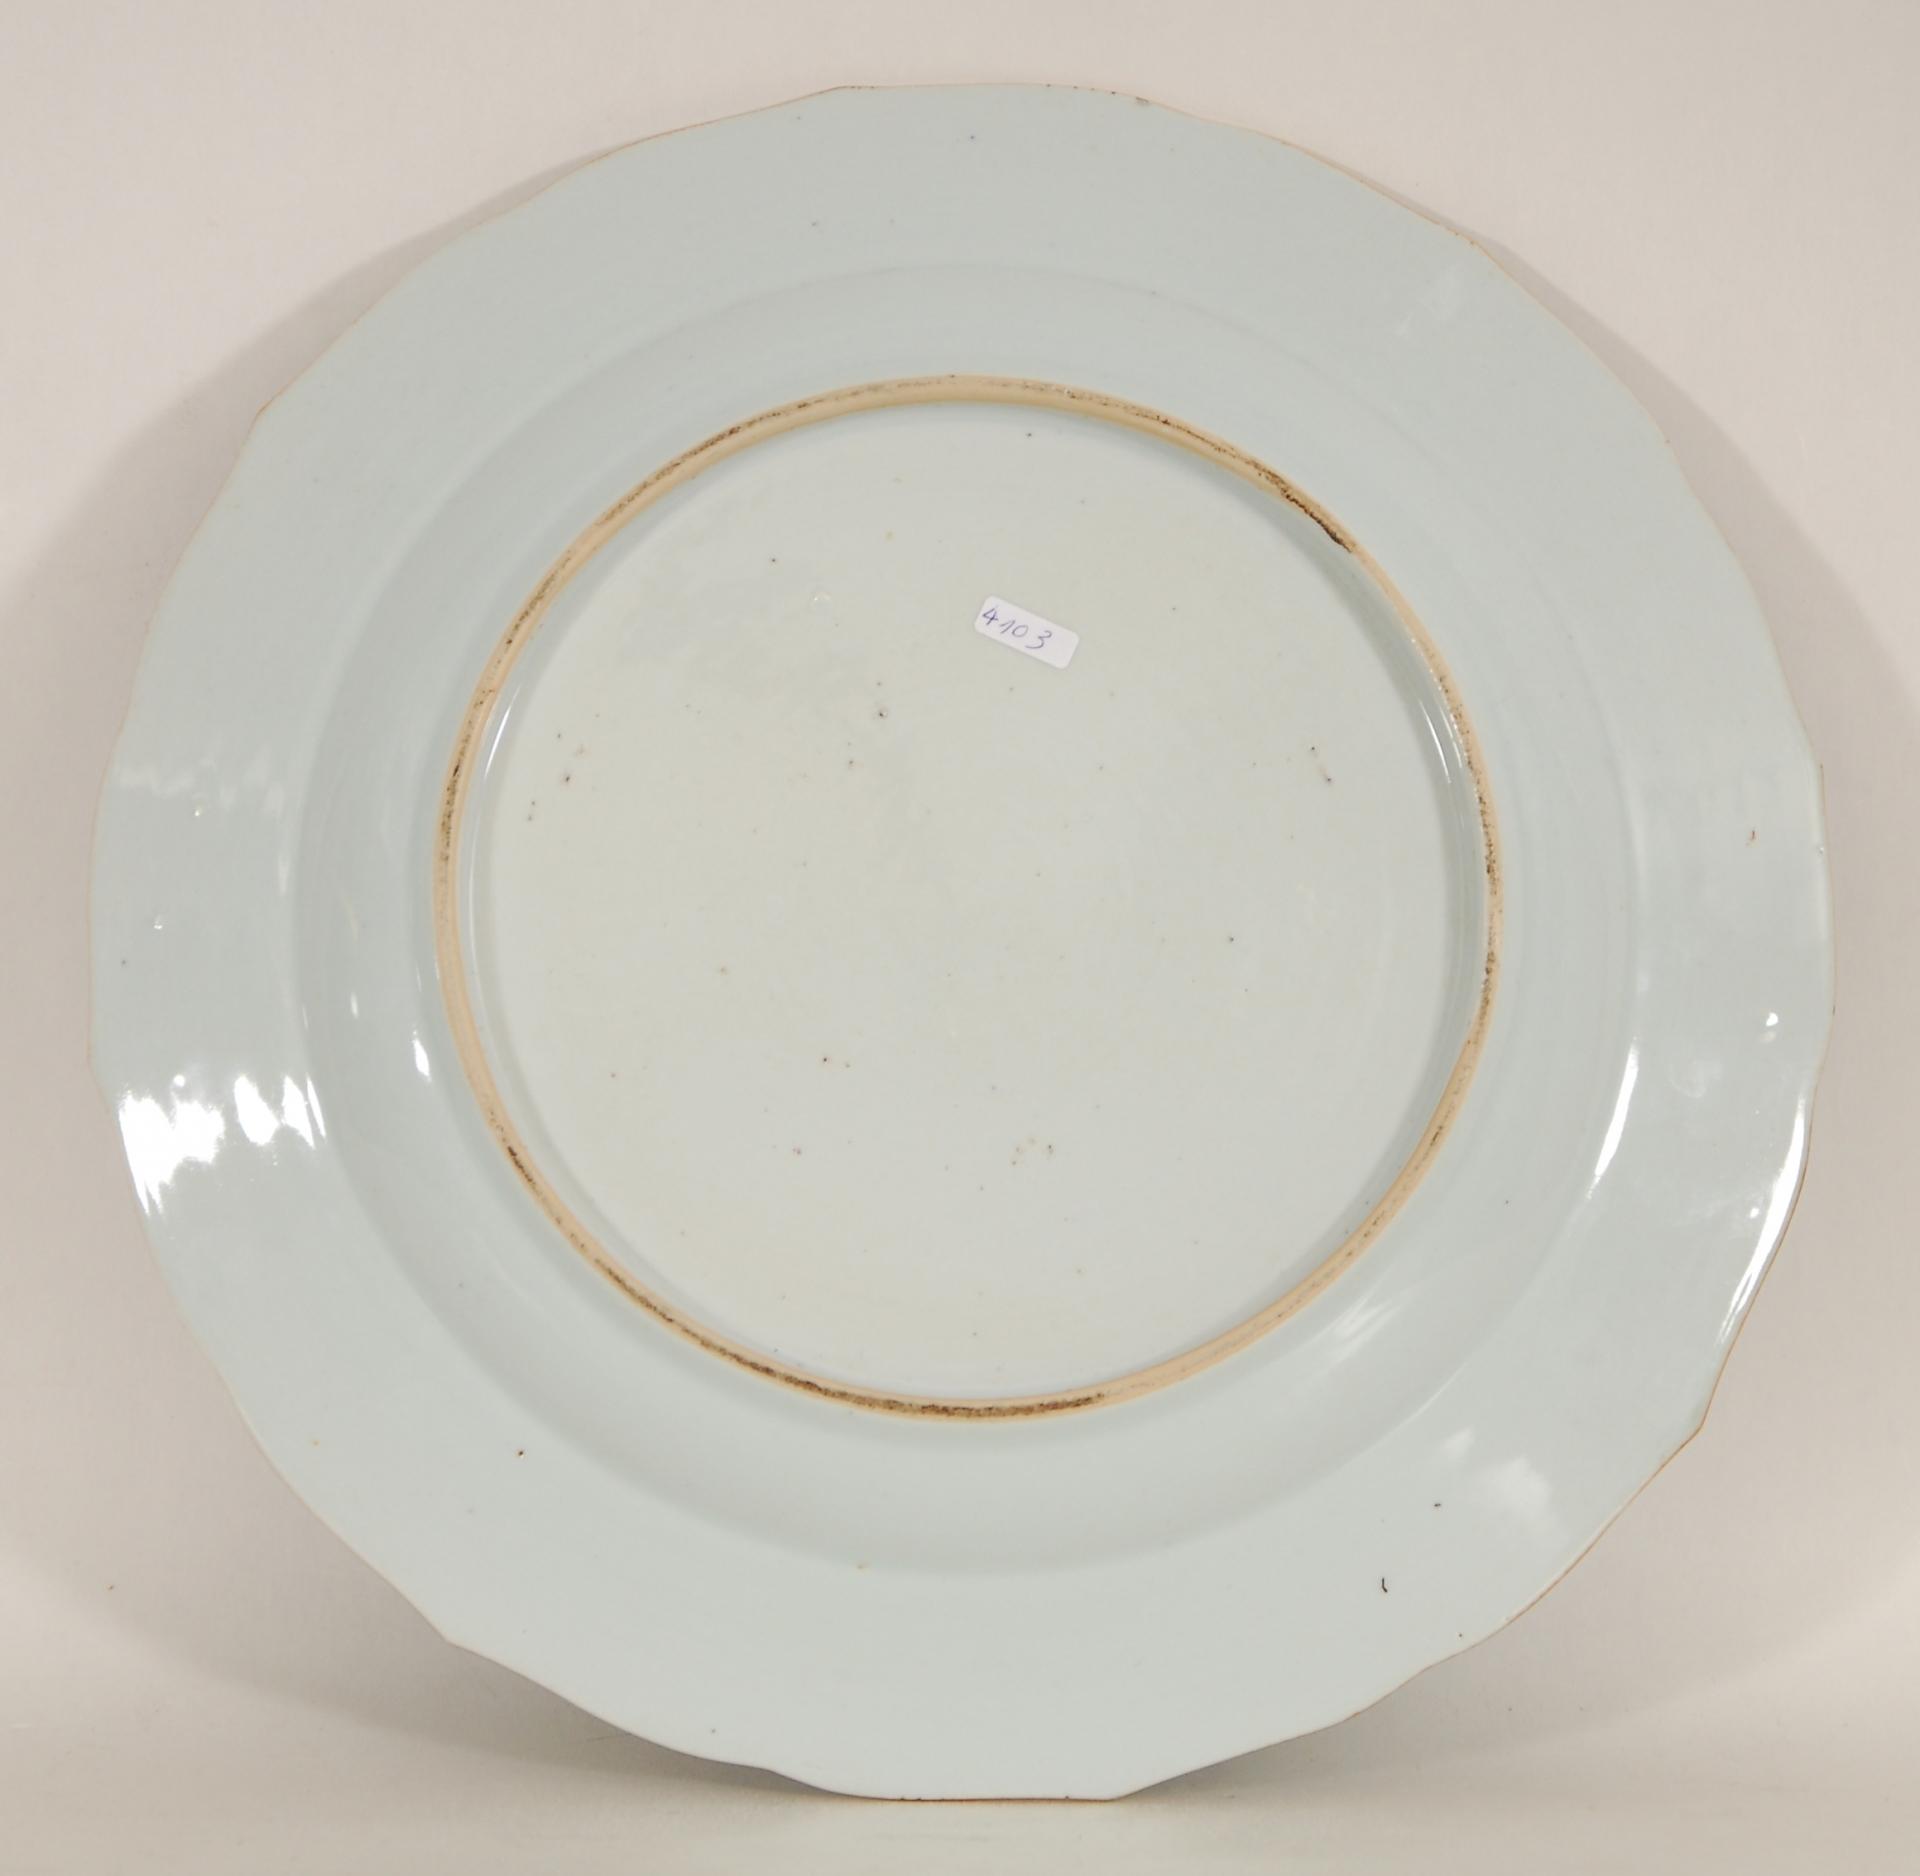 Grand plat